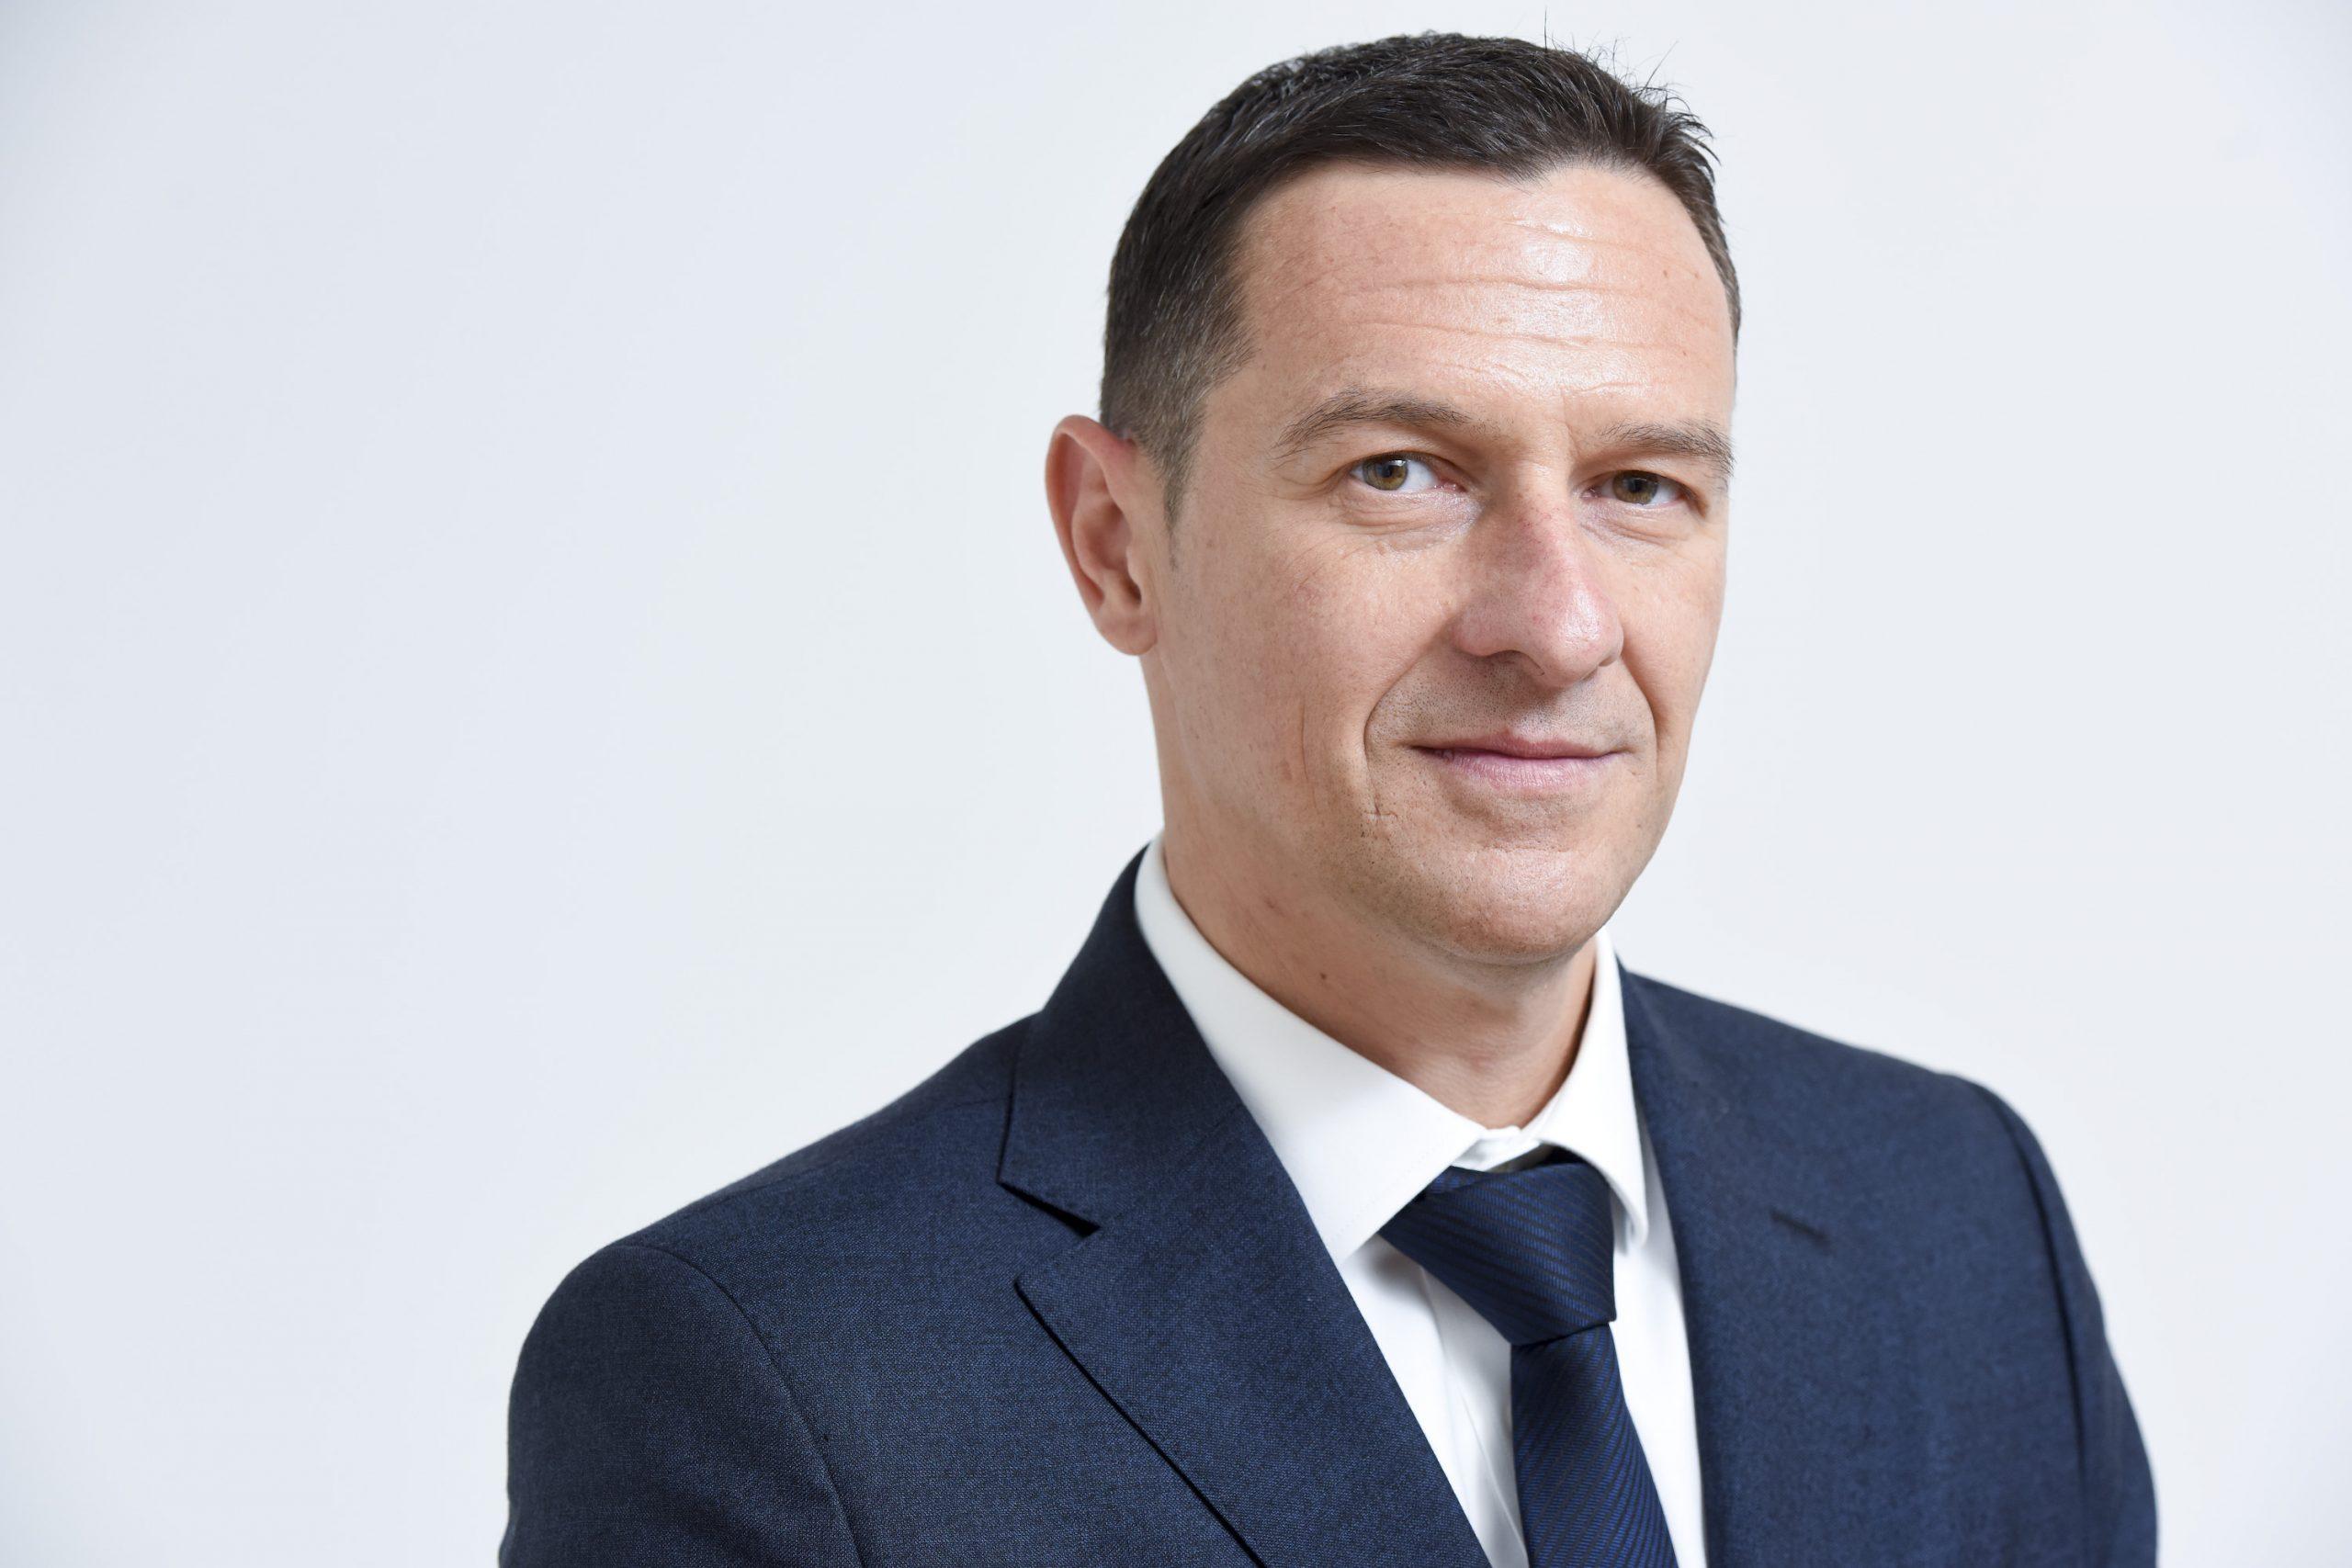 Eugen Sunara, Hrvatska Lutrija, Member of the Managing Board 1 - hrpsor Hrvatski poslovni savjet za održivi razvoj